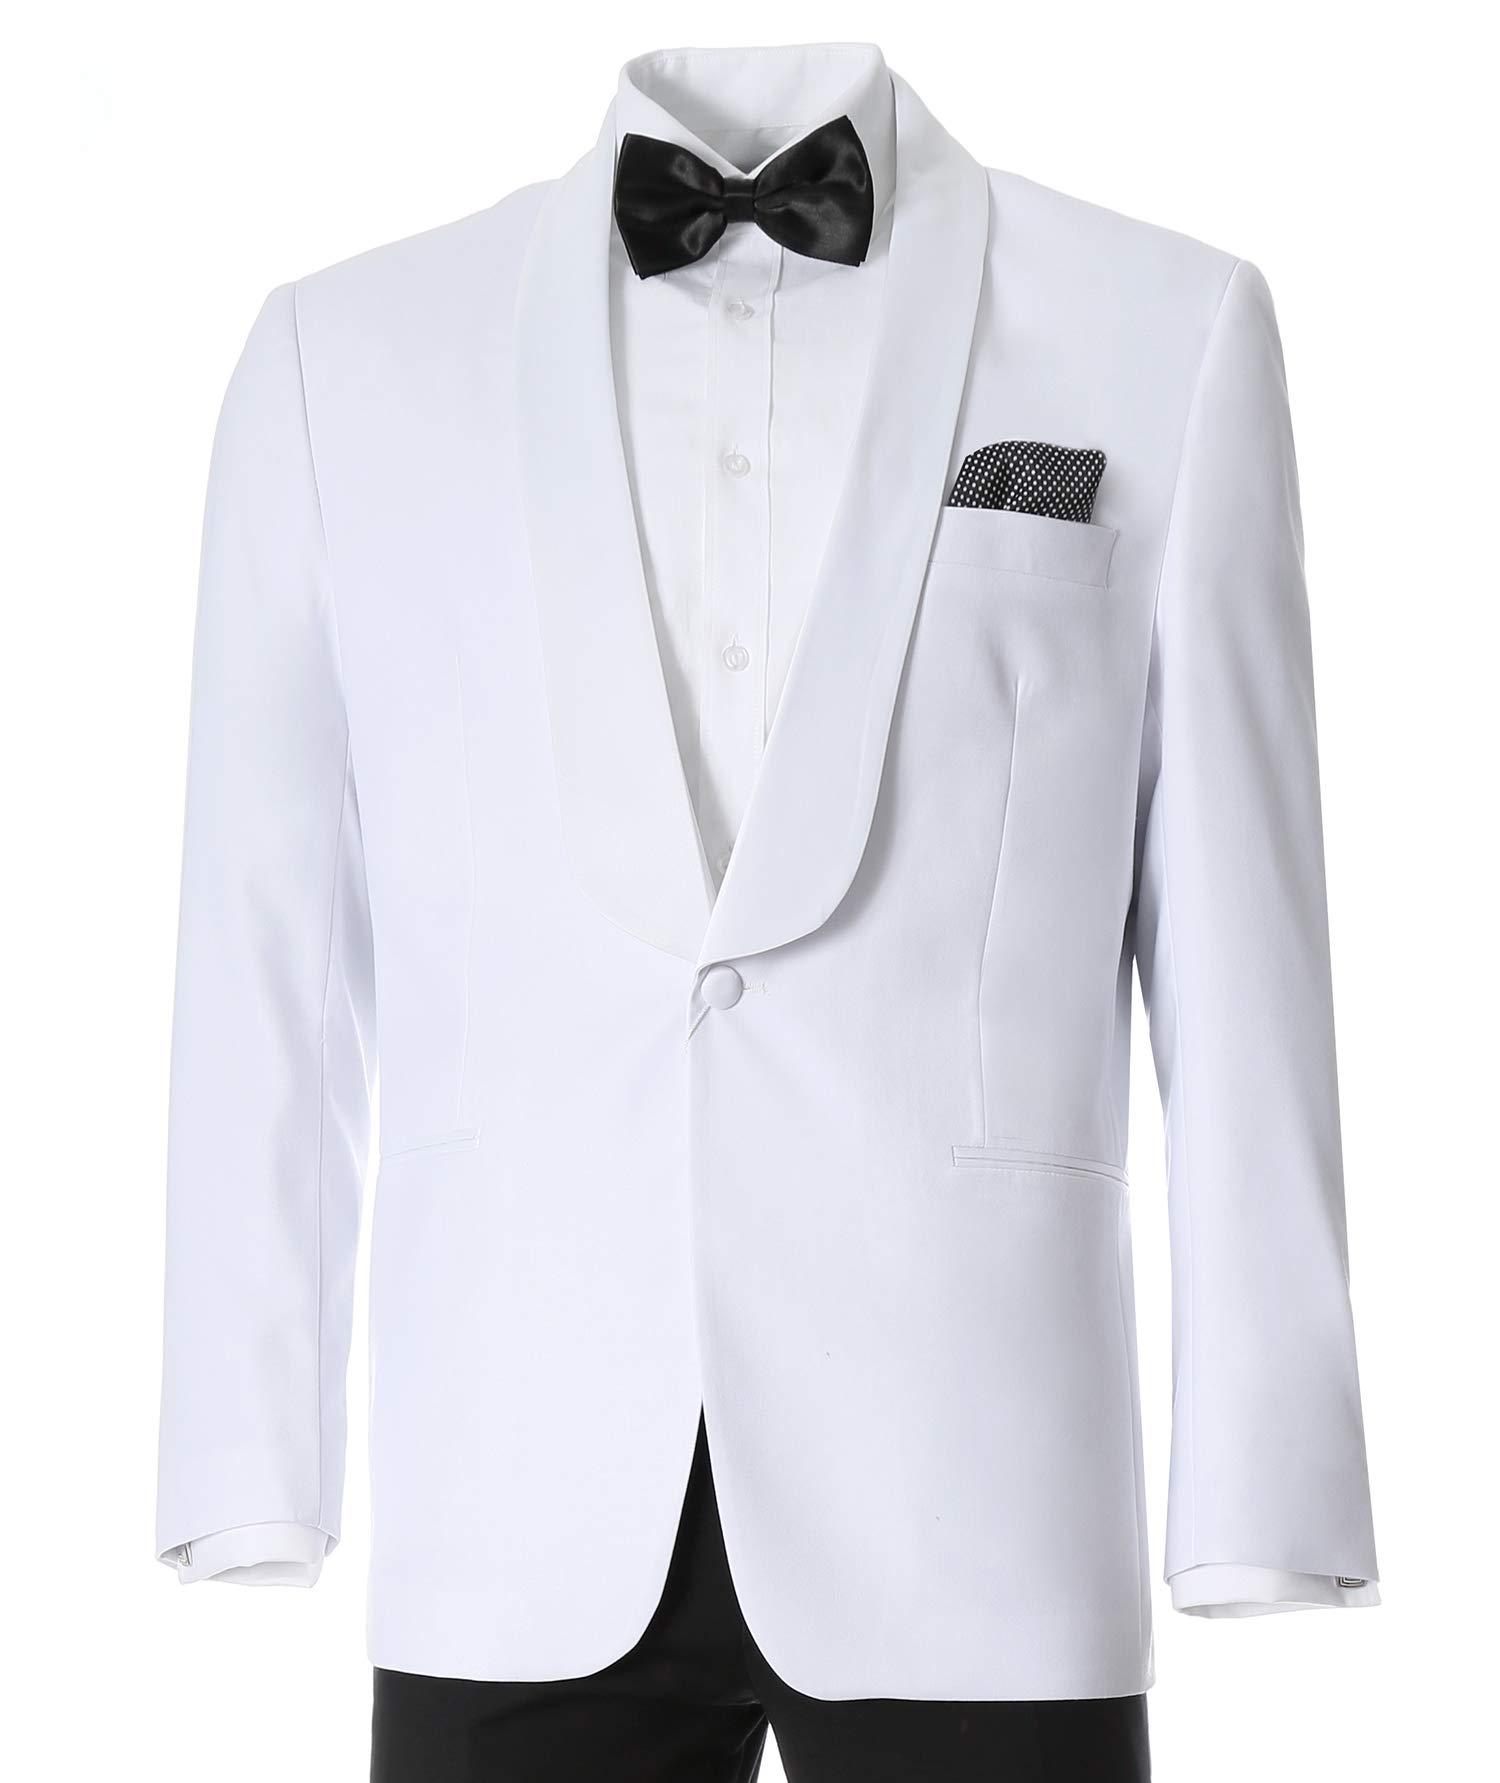 Ferrecci Men's Echo White Slim Fit Shawl Lapel Tuxedo Dinner Jacket (50 Regular) by Ferrecci